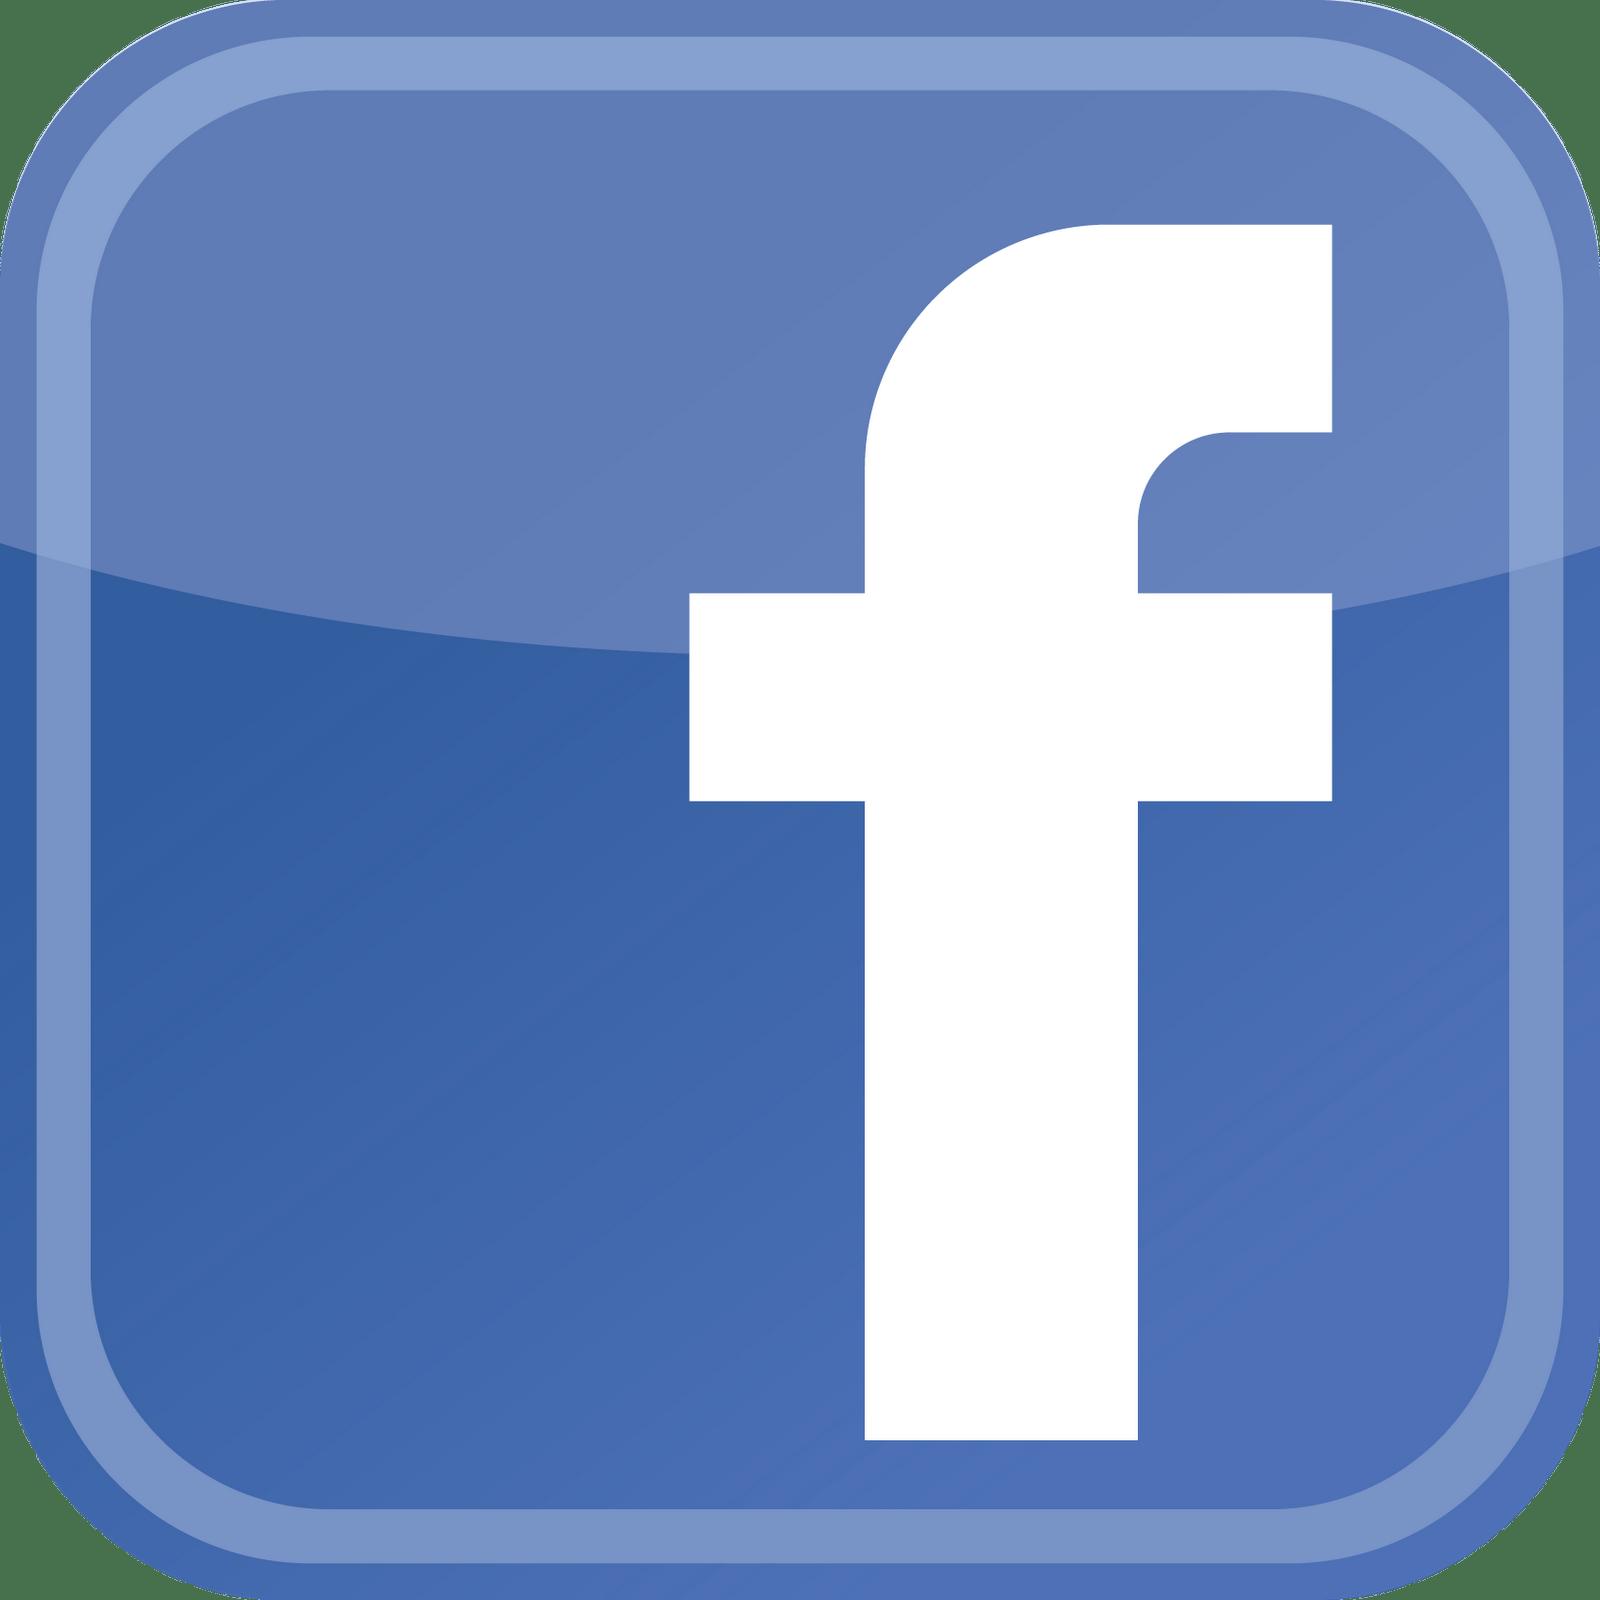 facebook-logo-png-7